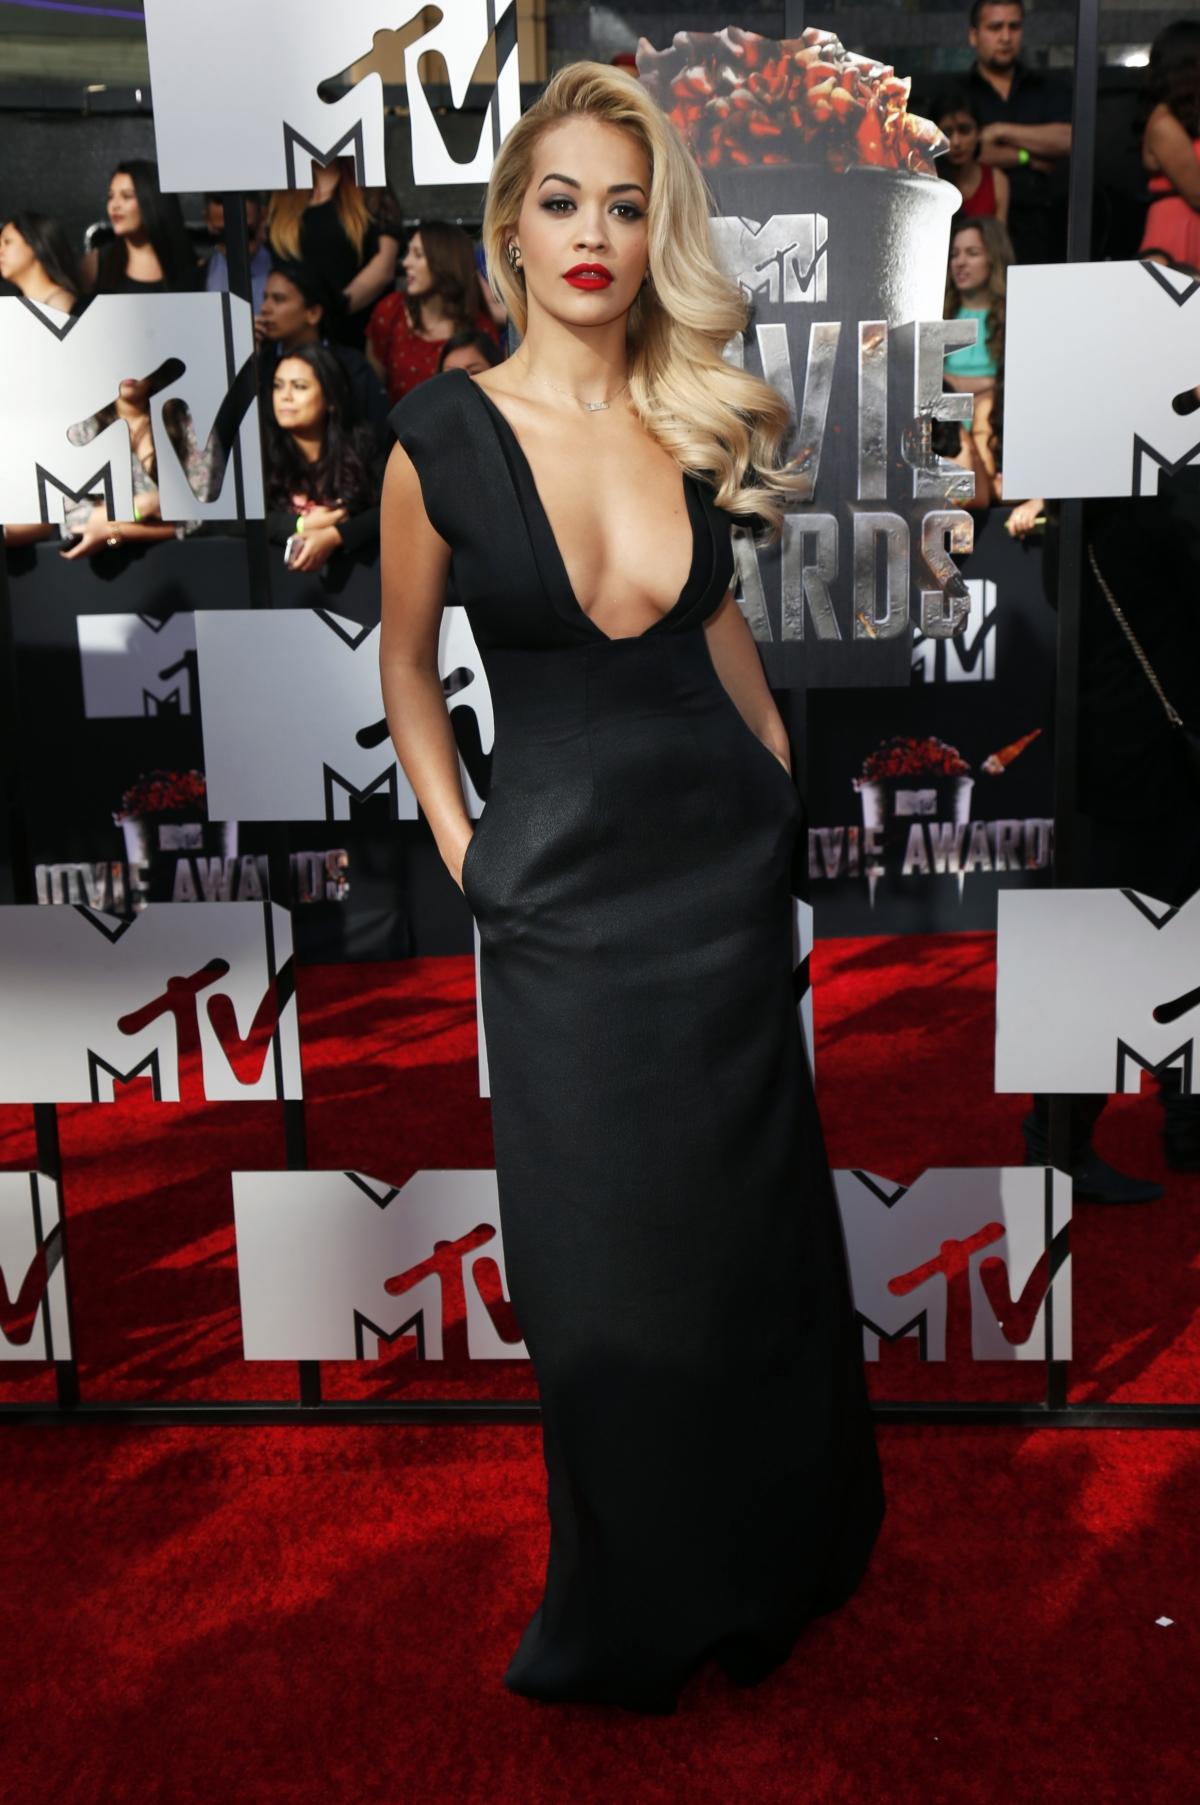 Singer Rita Ora arrives at the 2014 MTV Movie Awards in Los Angeles, California